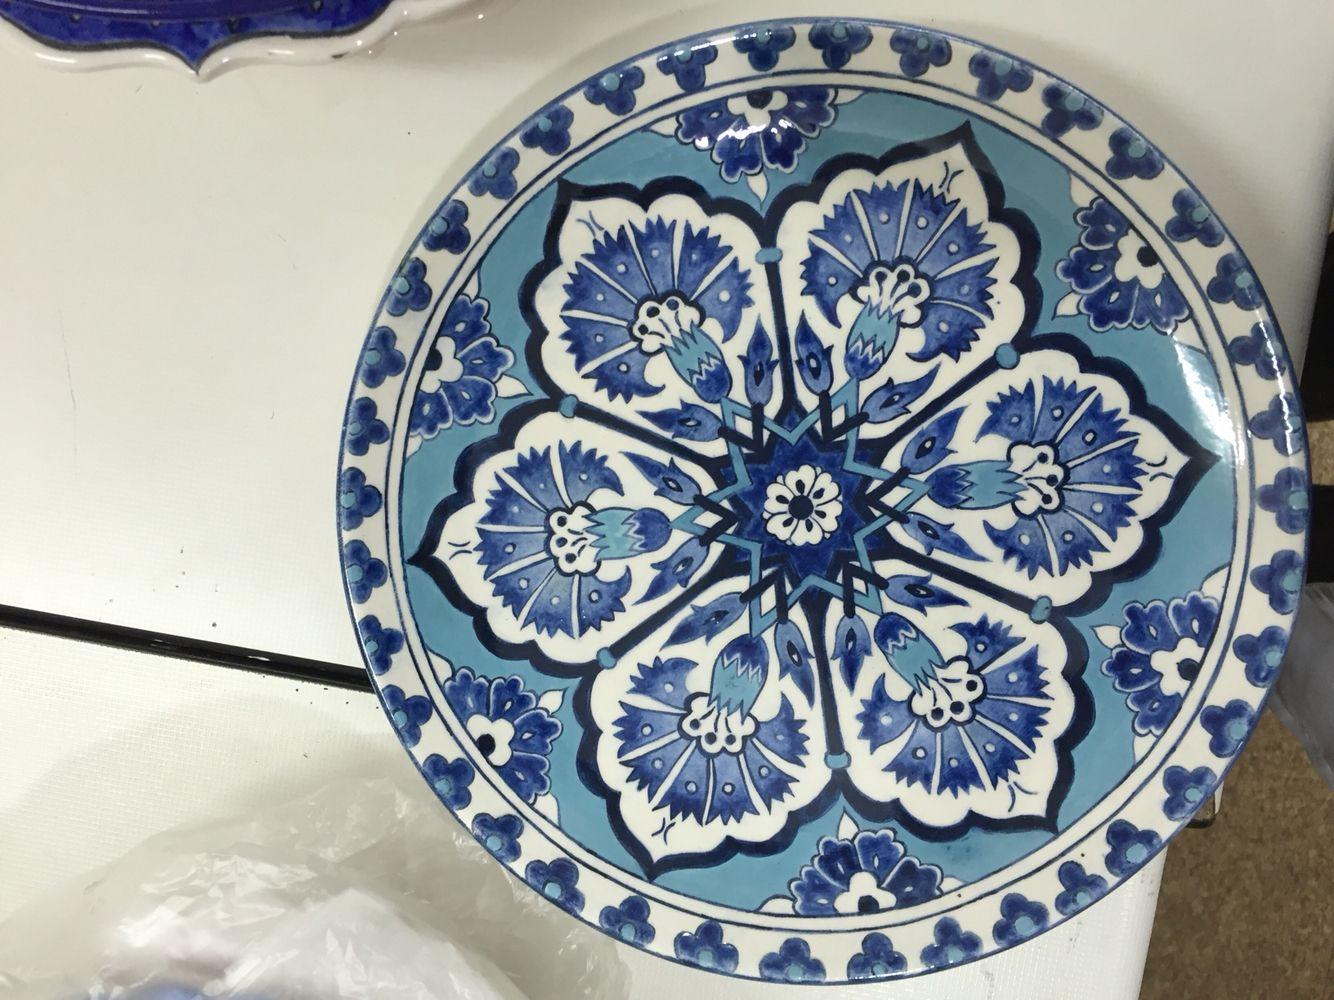 Картинки узорами и орнаменты на посуде